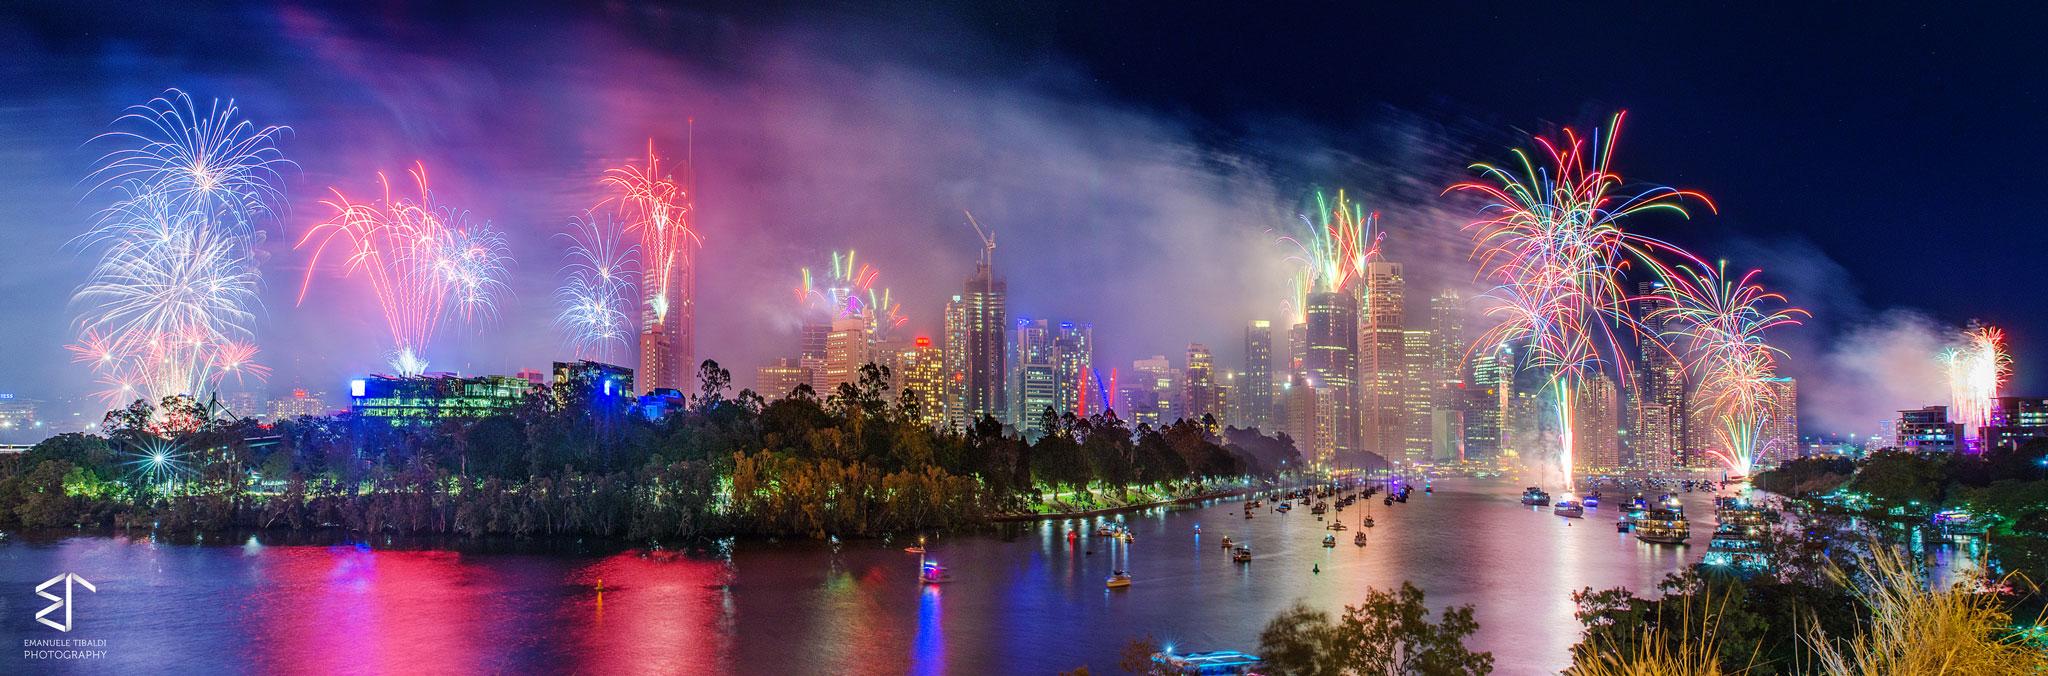 Paesaggi-Australia - Riverfire - Fuochi-d'artificio-Australia-fotografo-di-paesaggi - Fuochi-d'artificio-Australia-fotografo-di-paesaggi